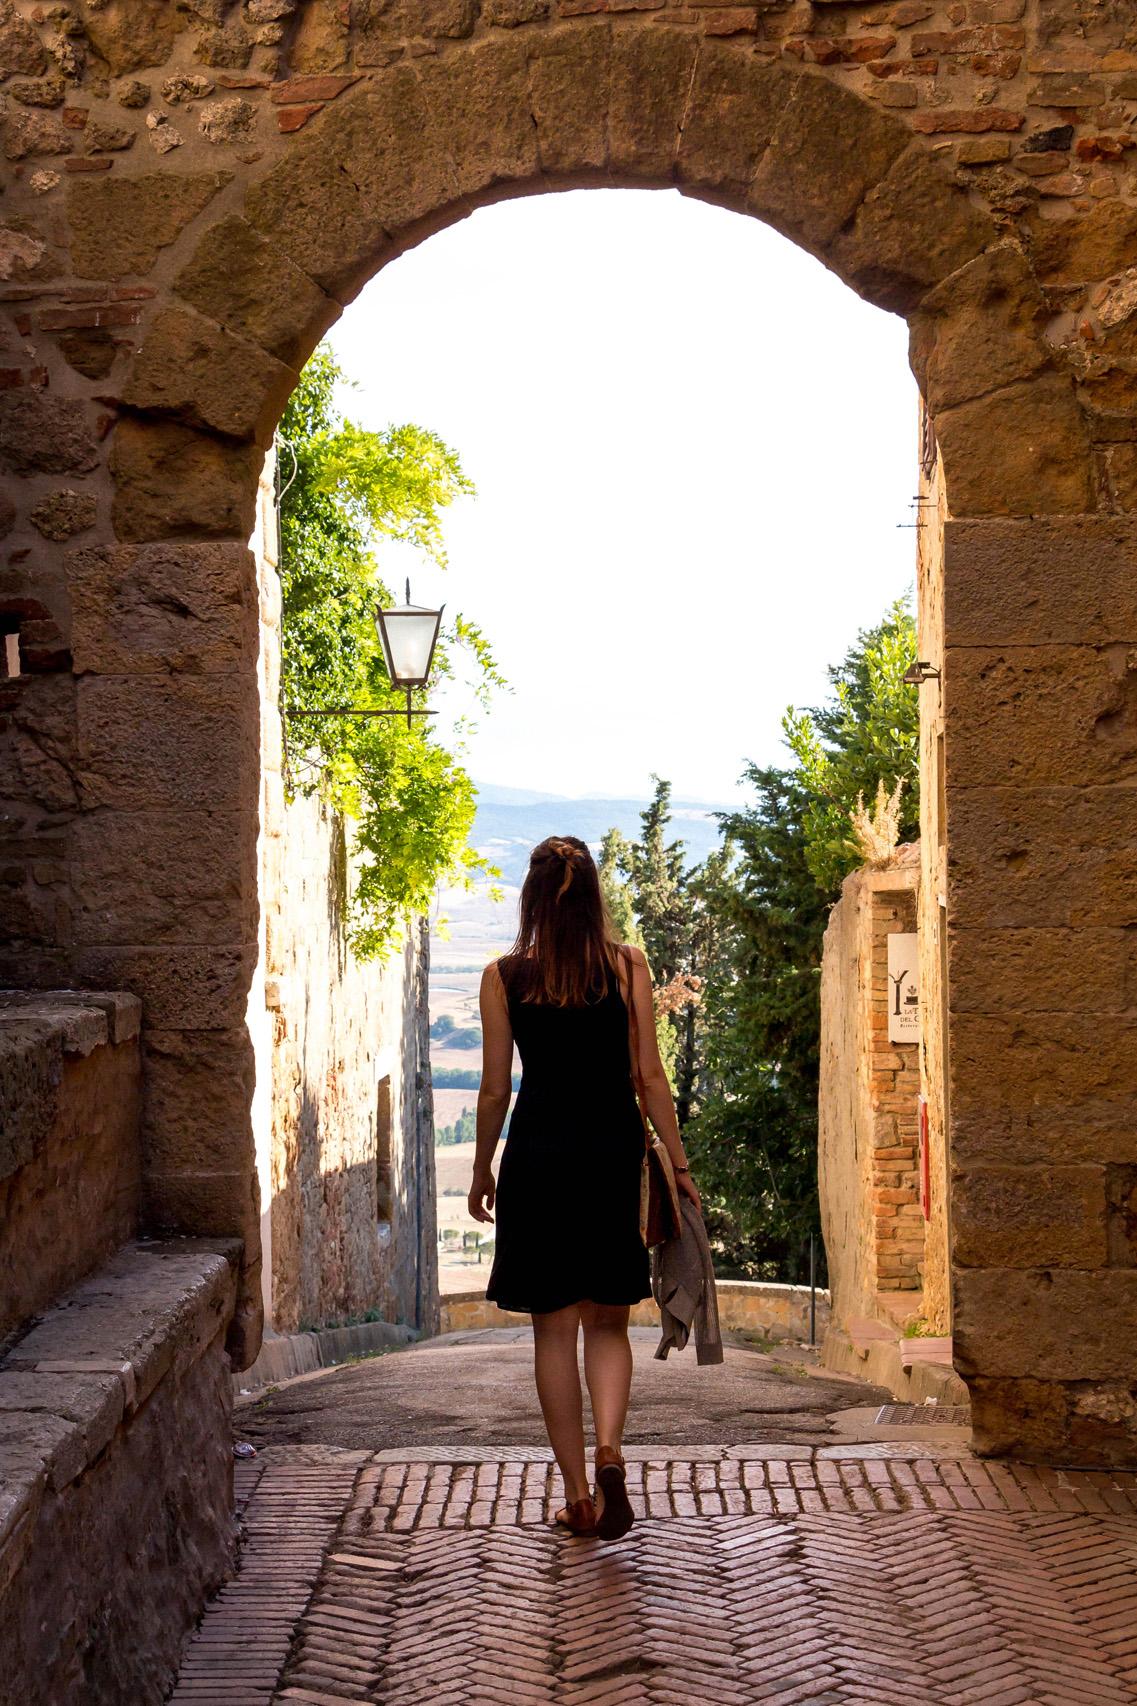 Walking the streets of Pienza, Tuscany